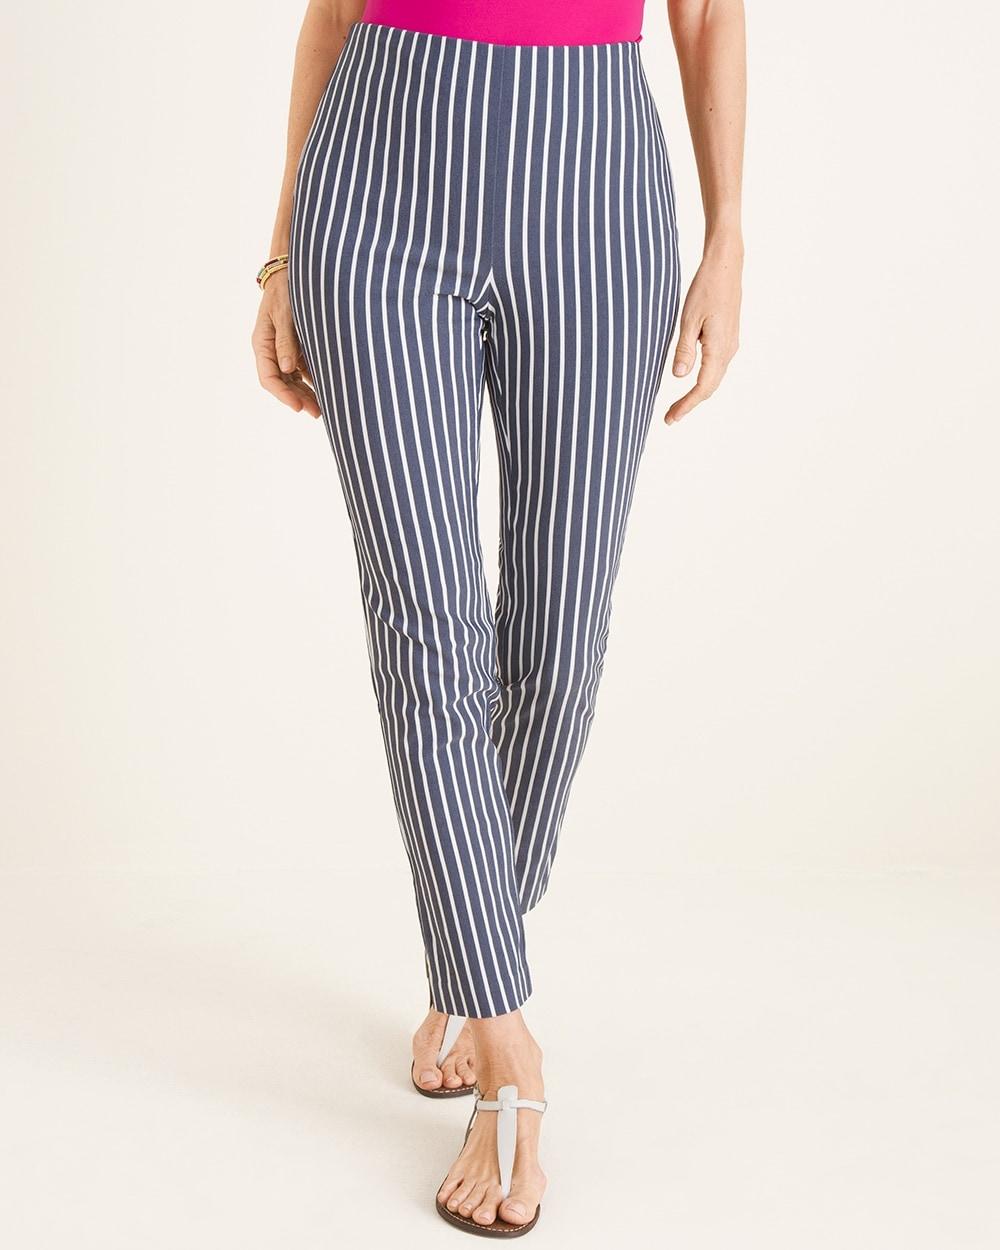 Brigitte Blue Striped Ankle Pants by So Slimming